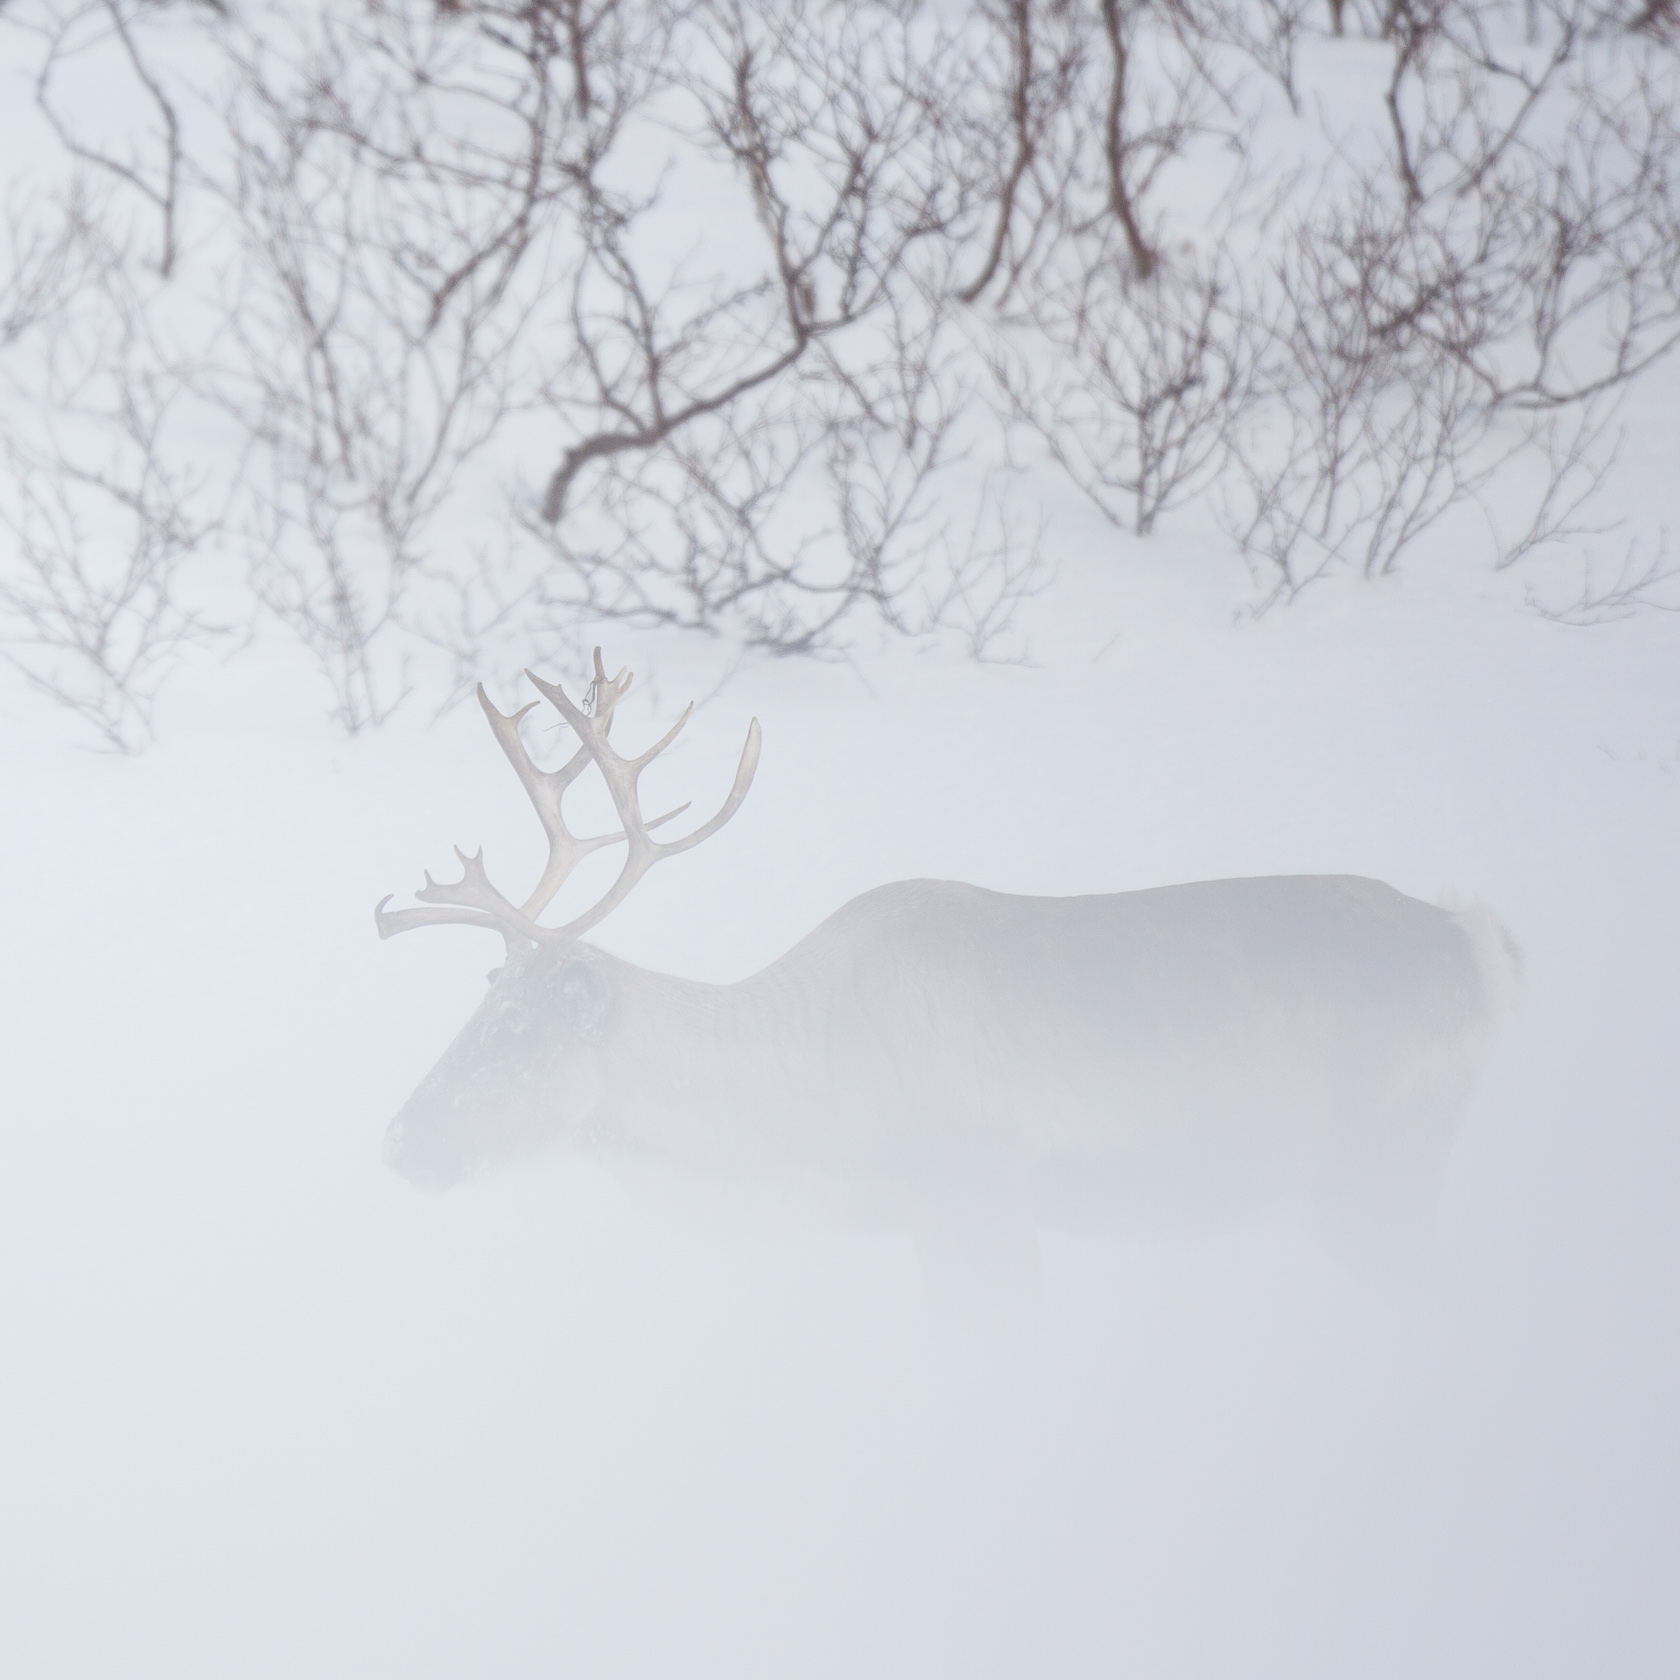 renne (Rangifer tarandus) à Senja, en Norvège